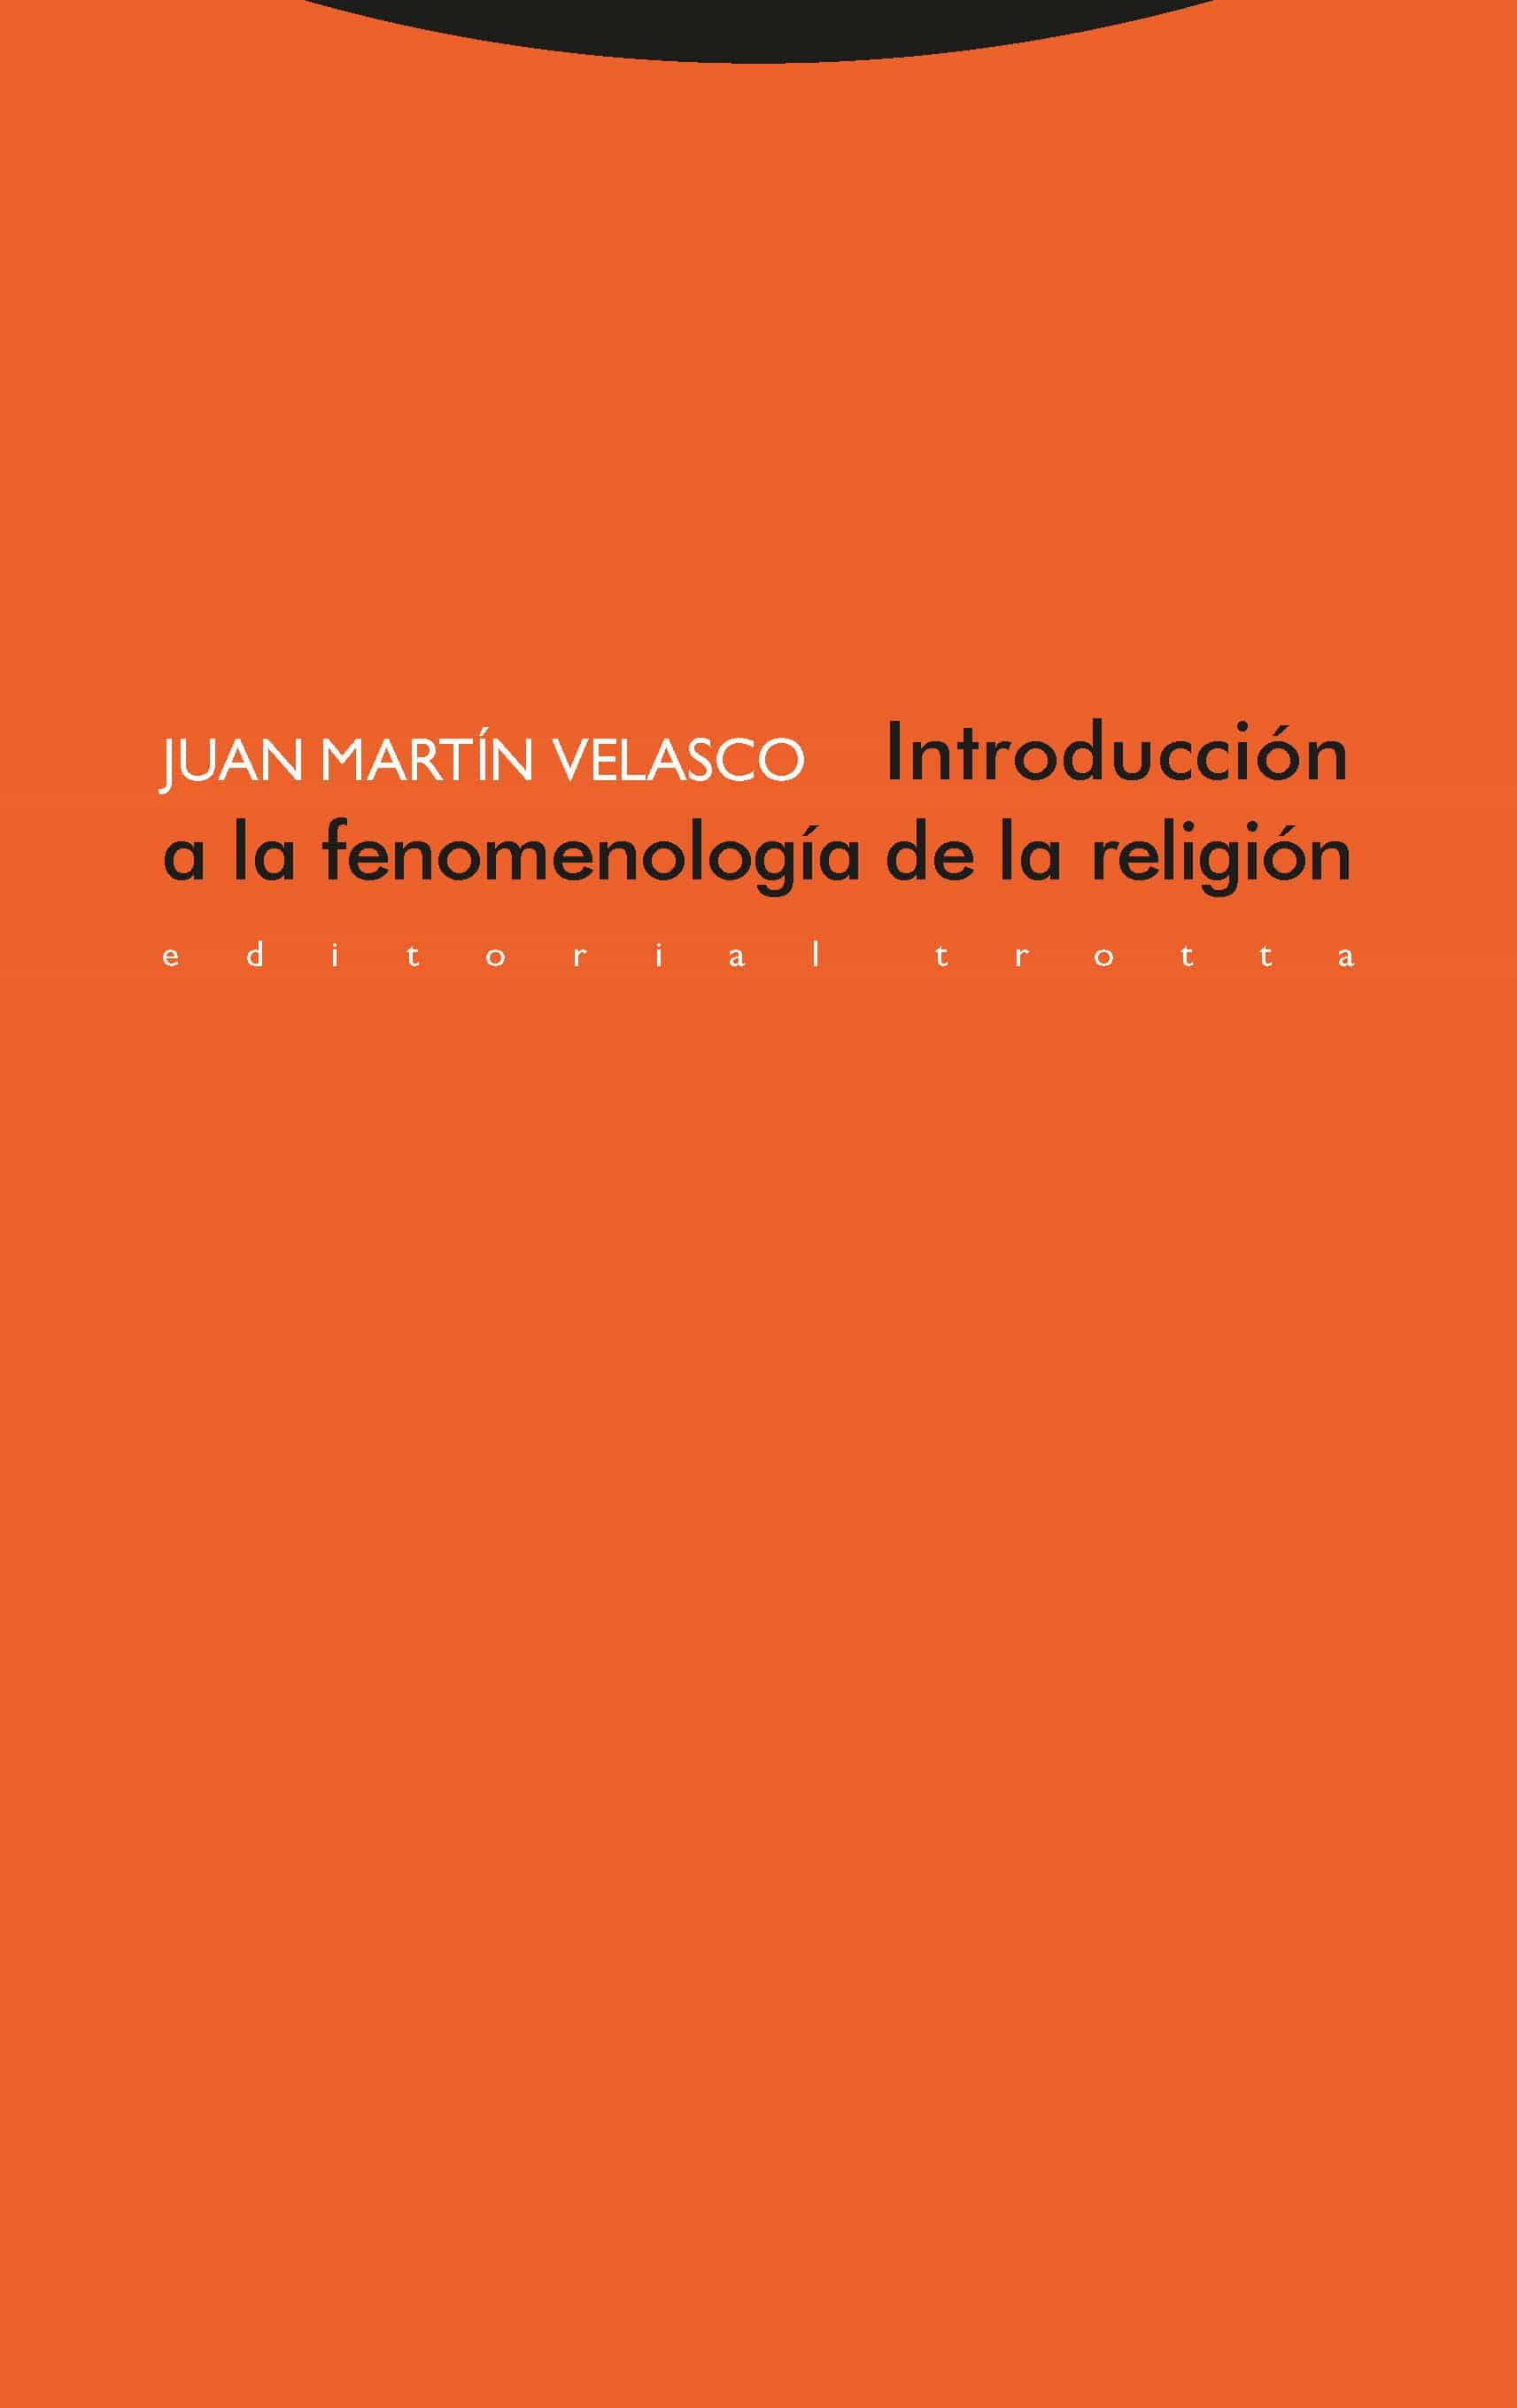 Introduccion A La Fenomenologia De La Religion - Martin Velasco Juan